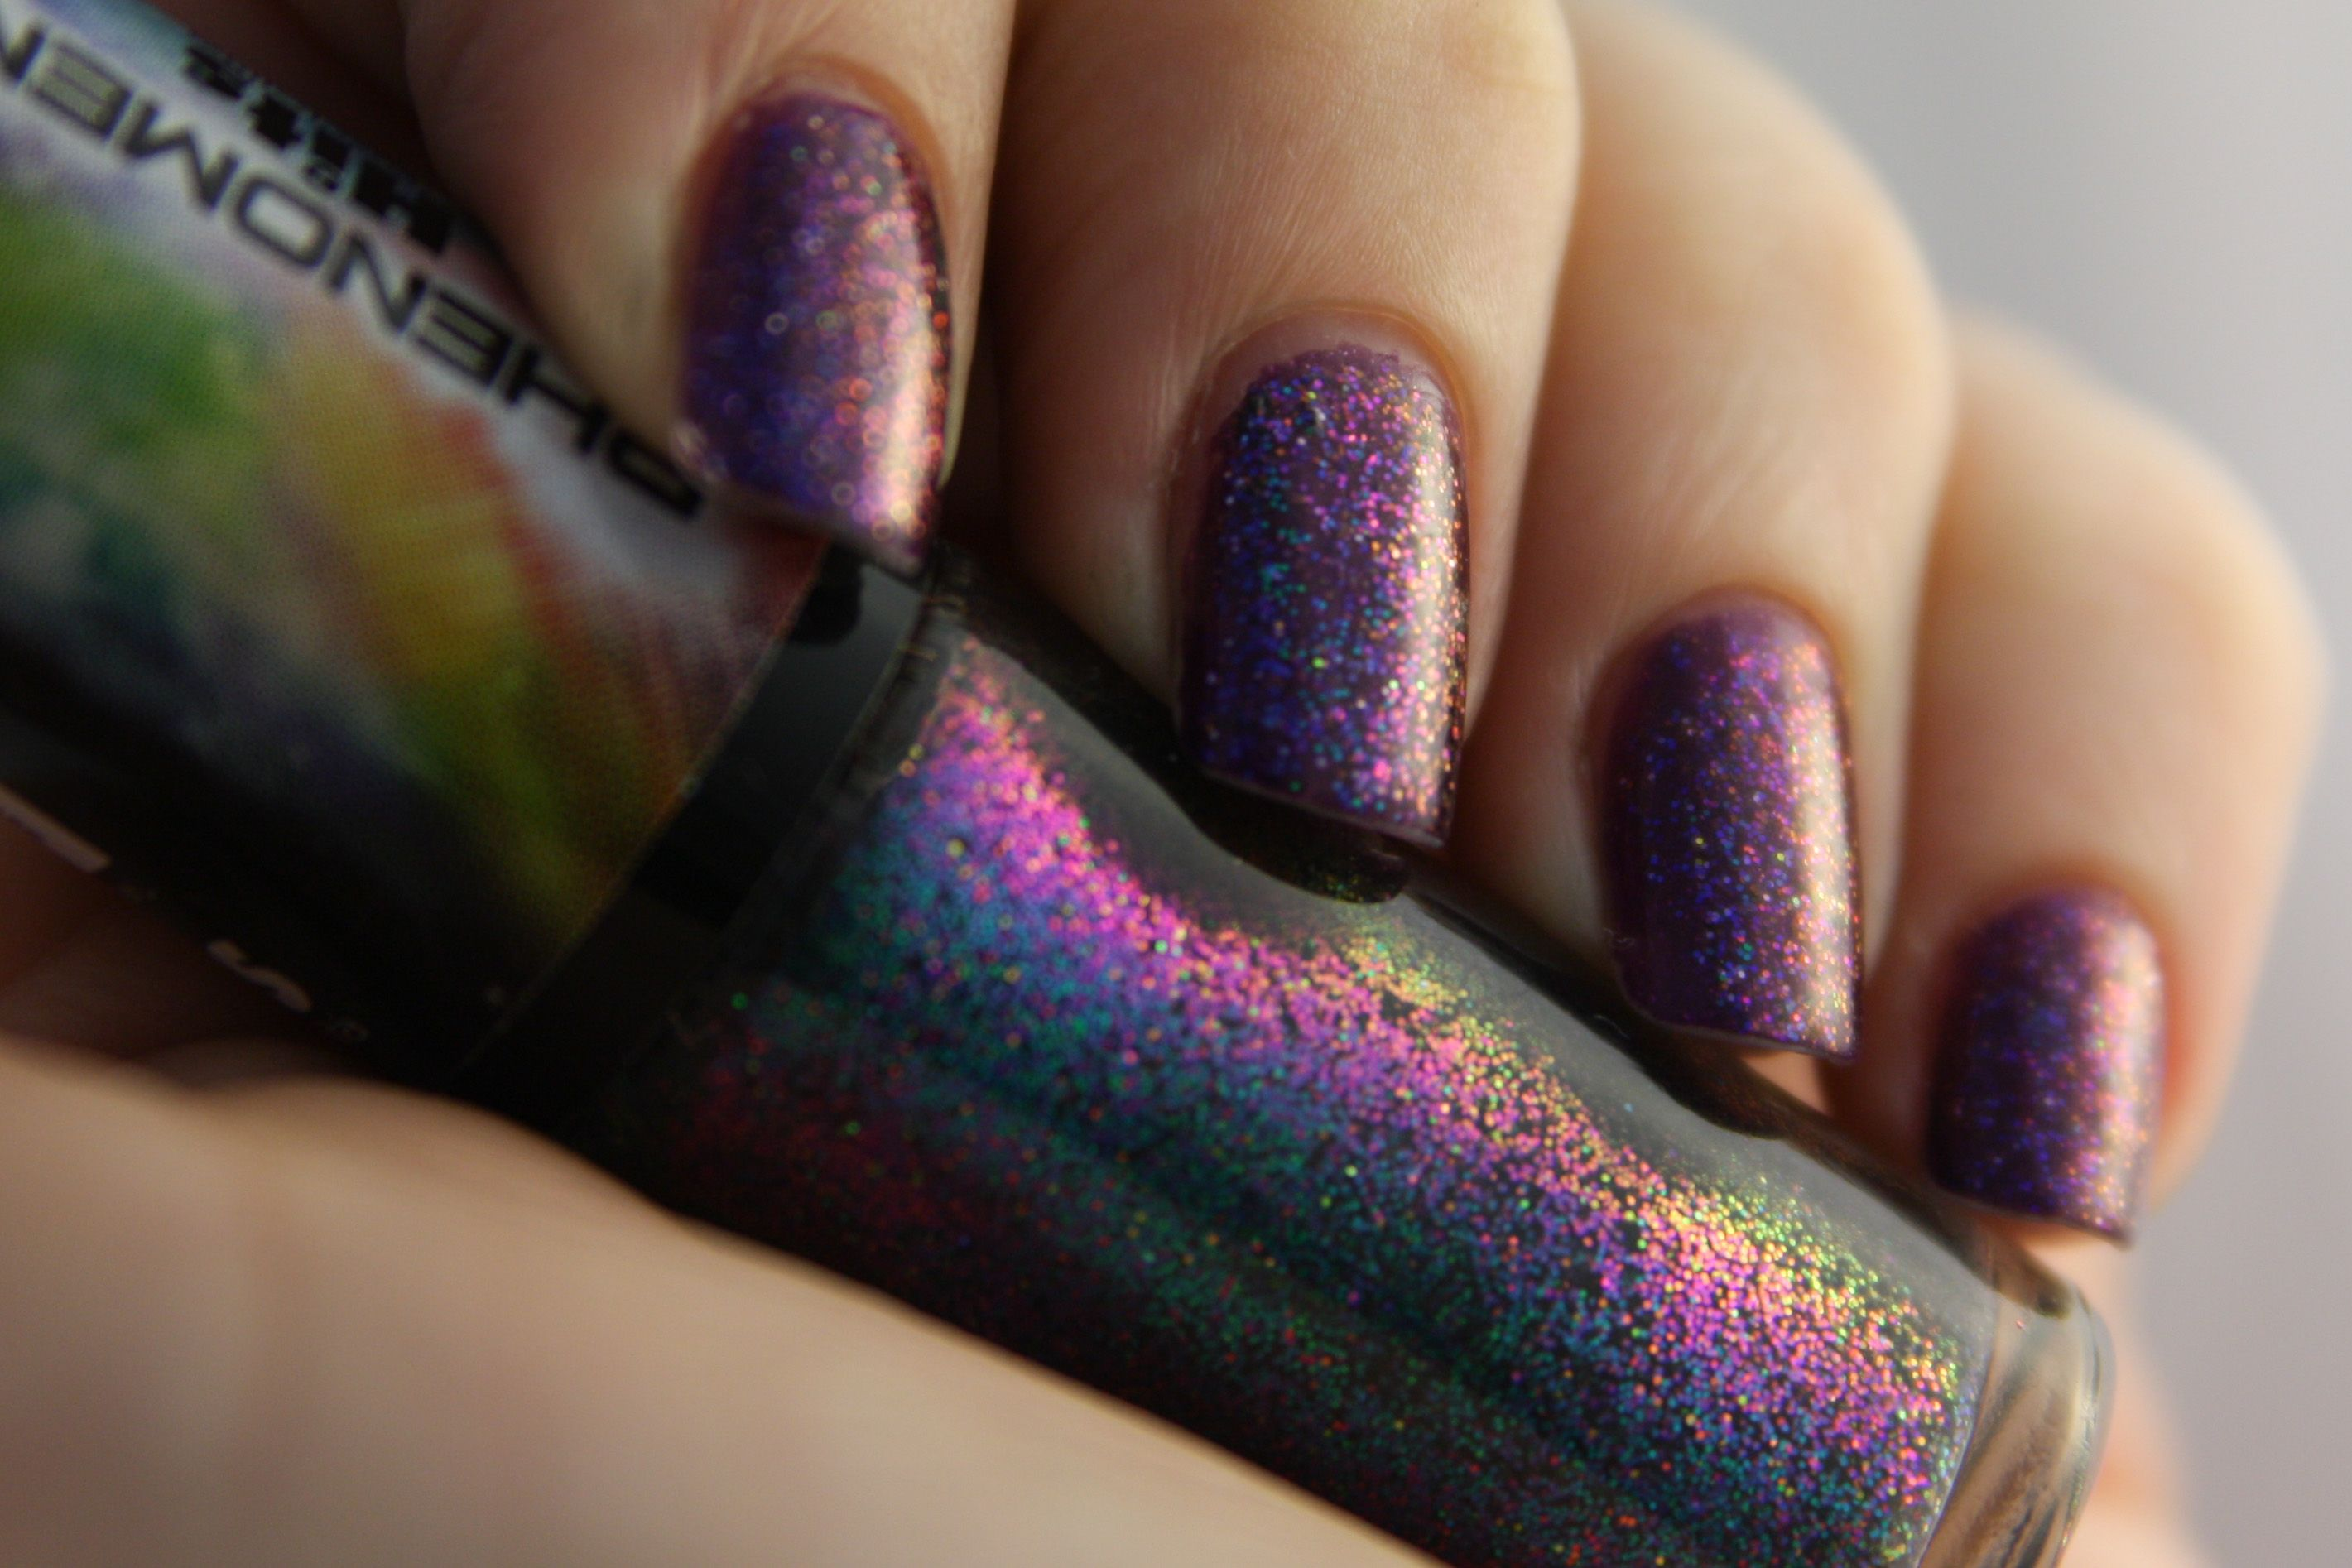 Purple glittery manicure.